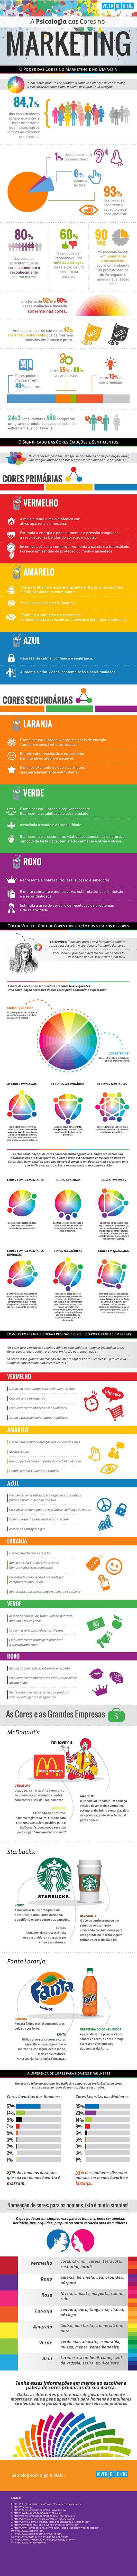 Infográfico Psicologia Cores 600 [Infográfico] A Psicologia das Cores no Marketing e no Dia a Dia